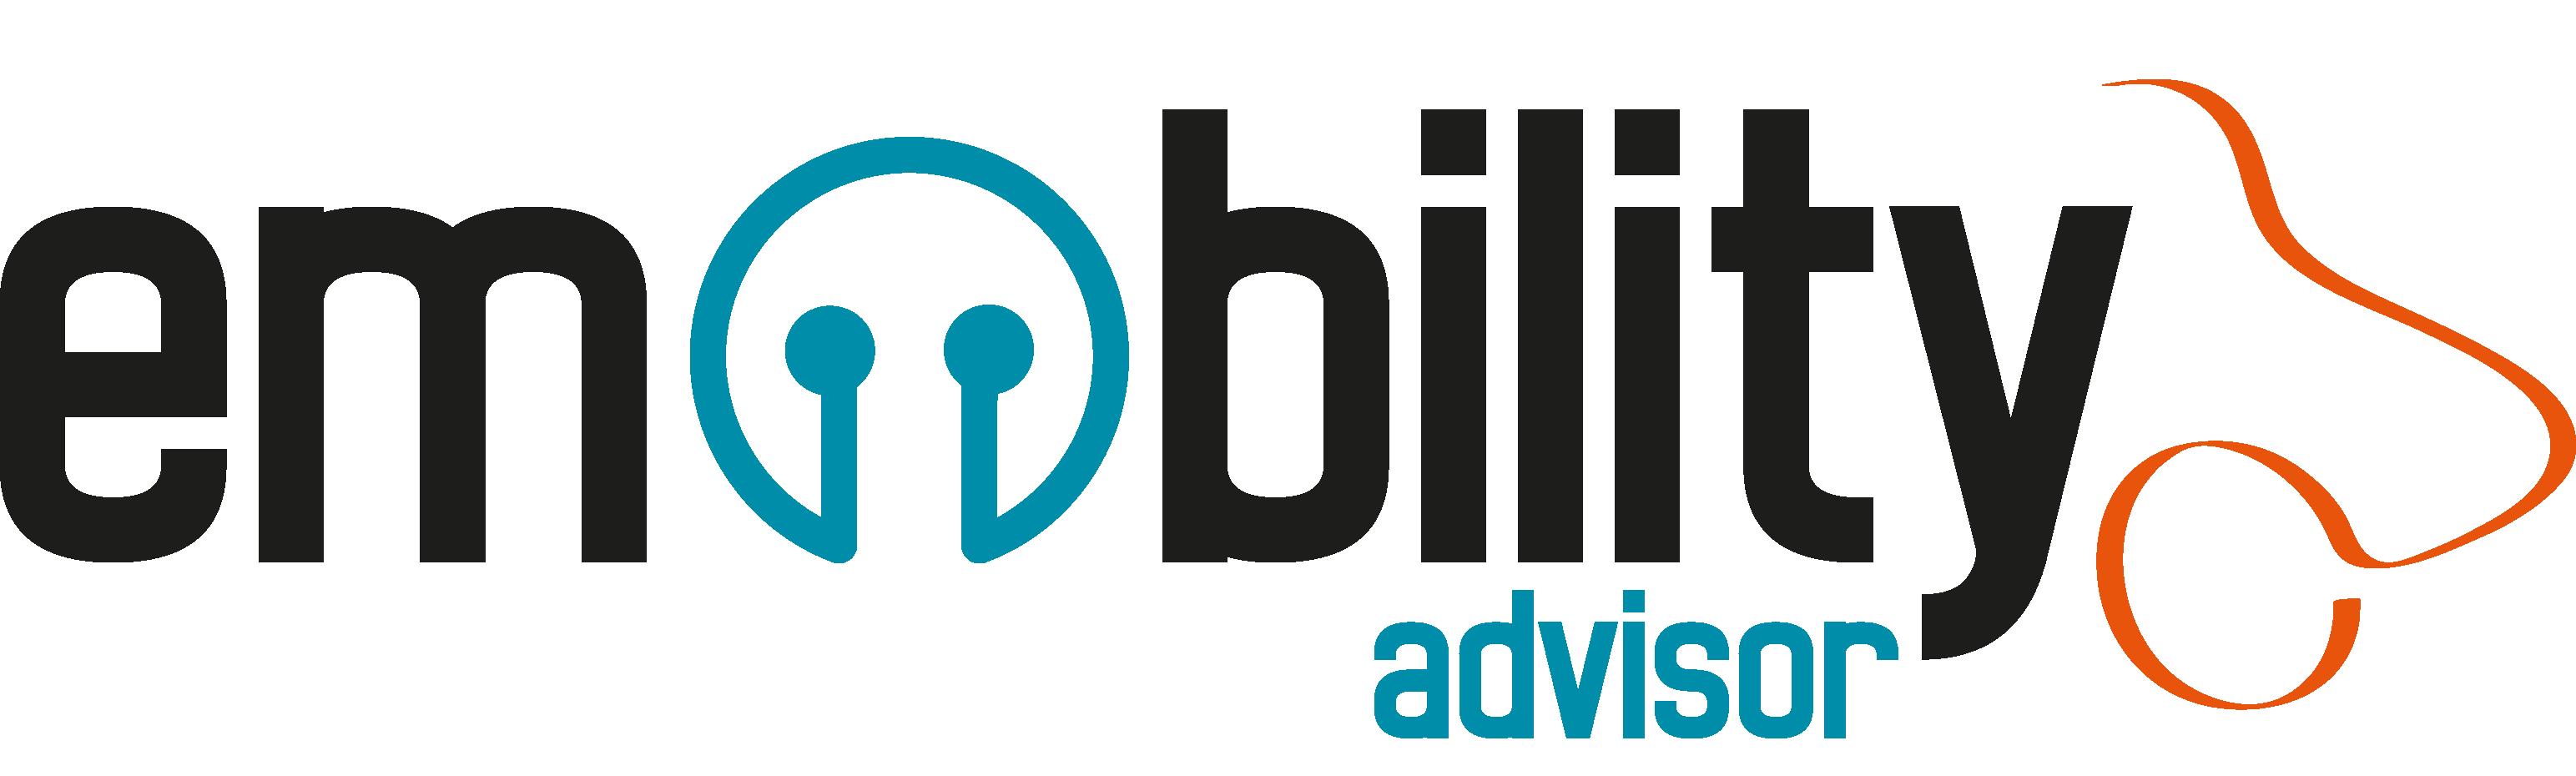 Emobility Advisor